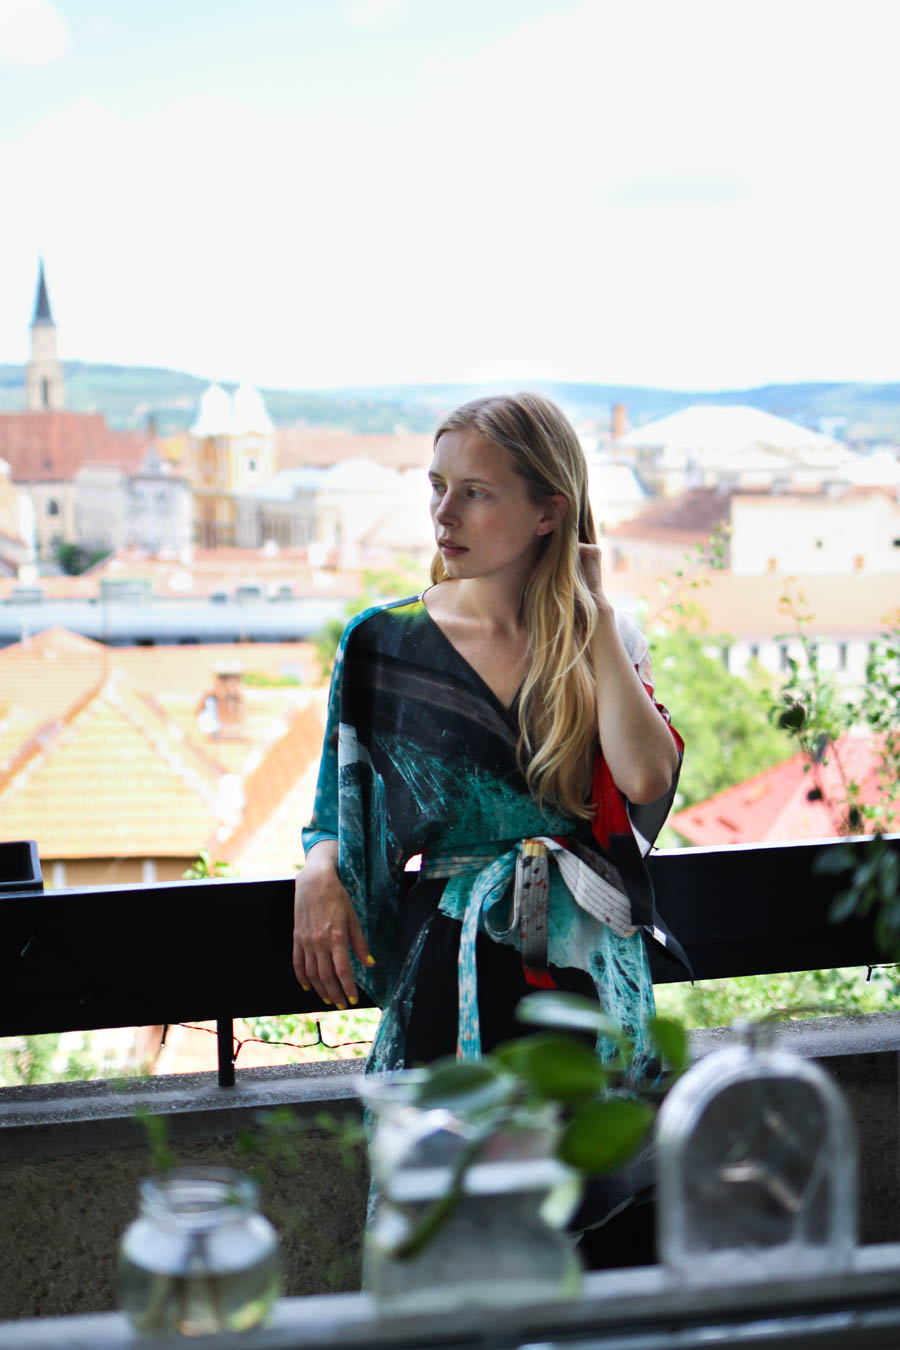 nemesis babe in transylvania cluj napoca marie my vacation-3 rumaenien